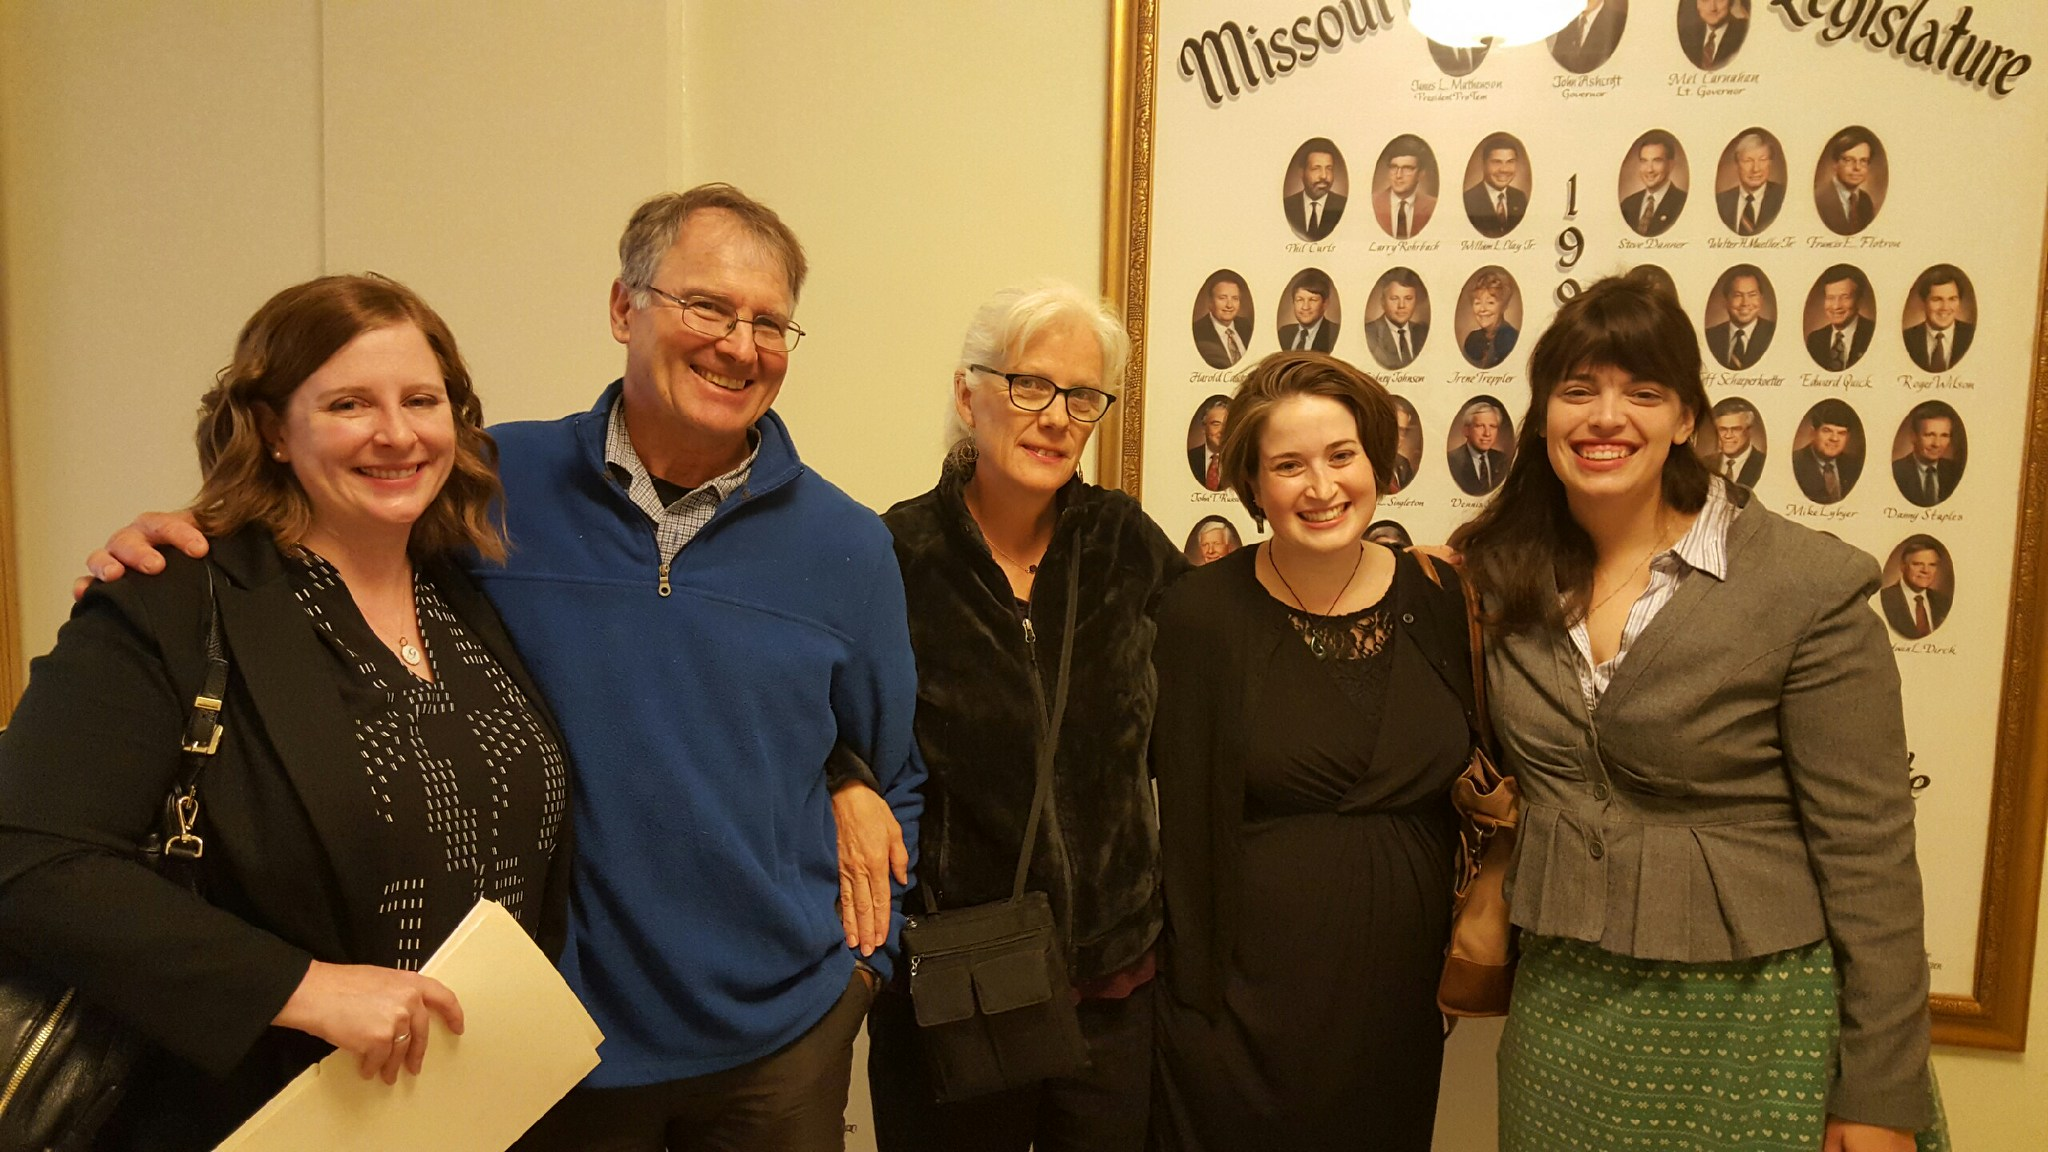 Me, Dan Mosby, Kathy Peterson, Rachel GOldberg, Sarah Baker of the ACLU. Photo by M'Evie Mead